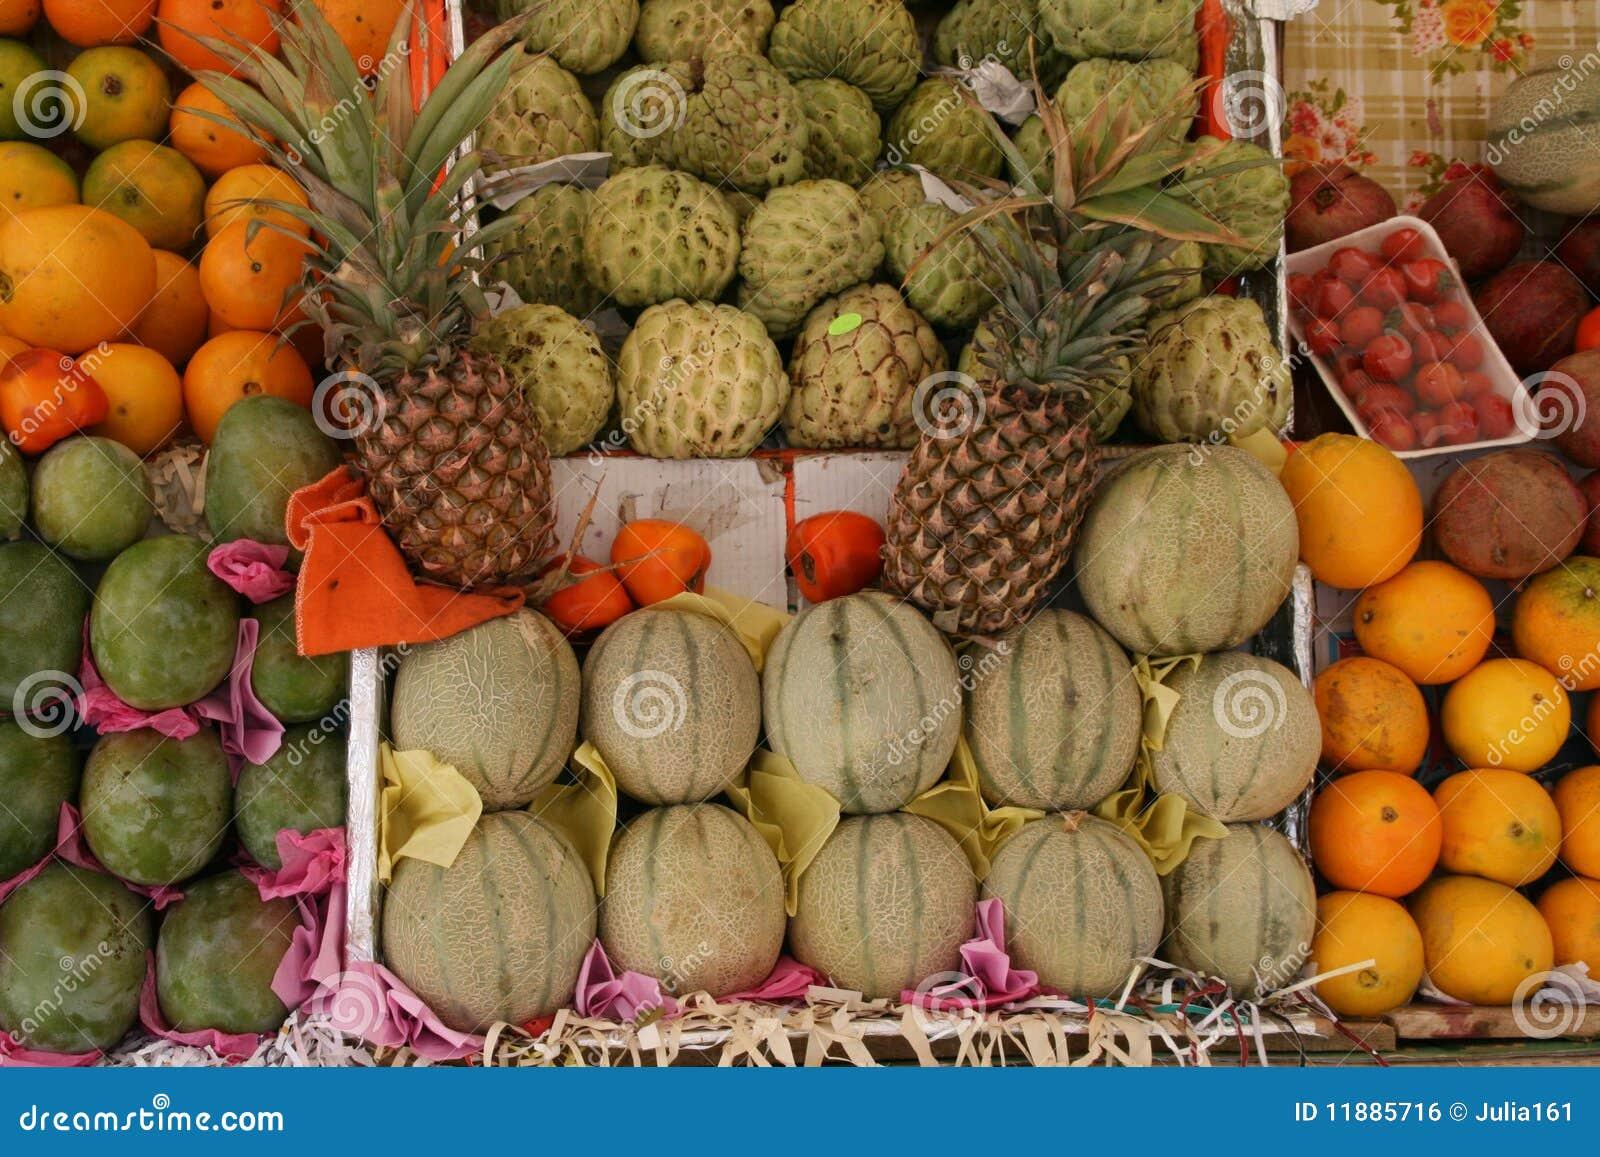 Fruit And Vegetable Market Egypt Royalty Free Stock Image